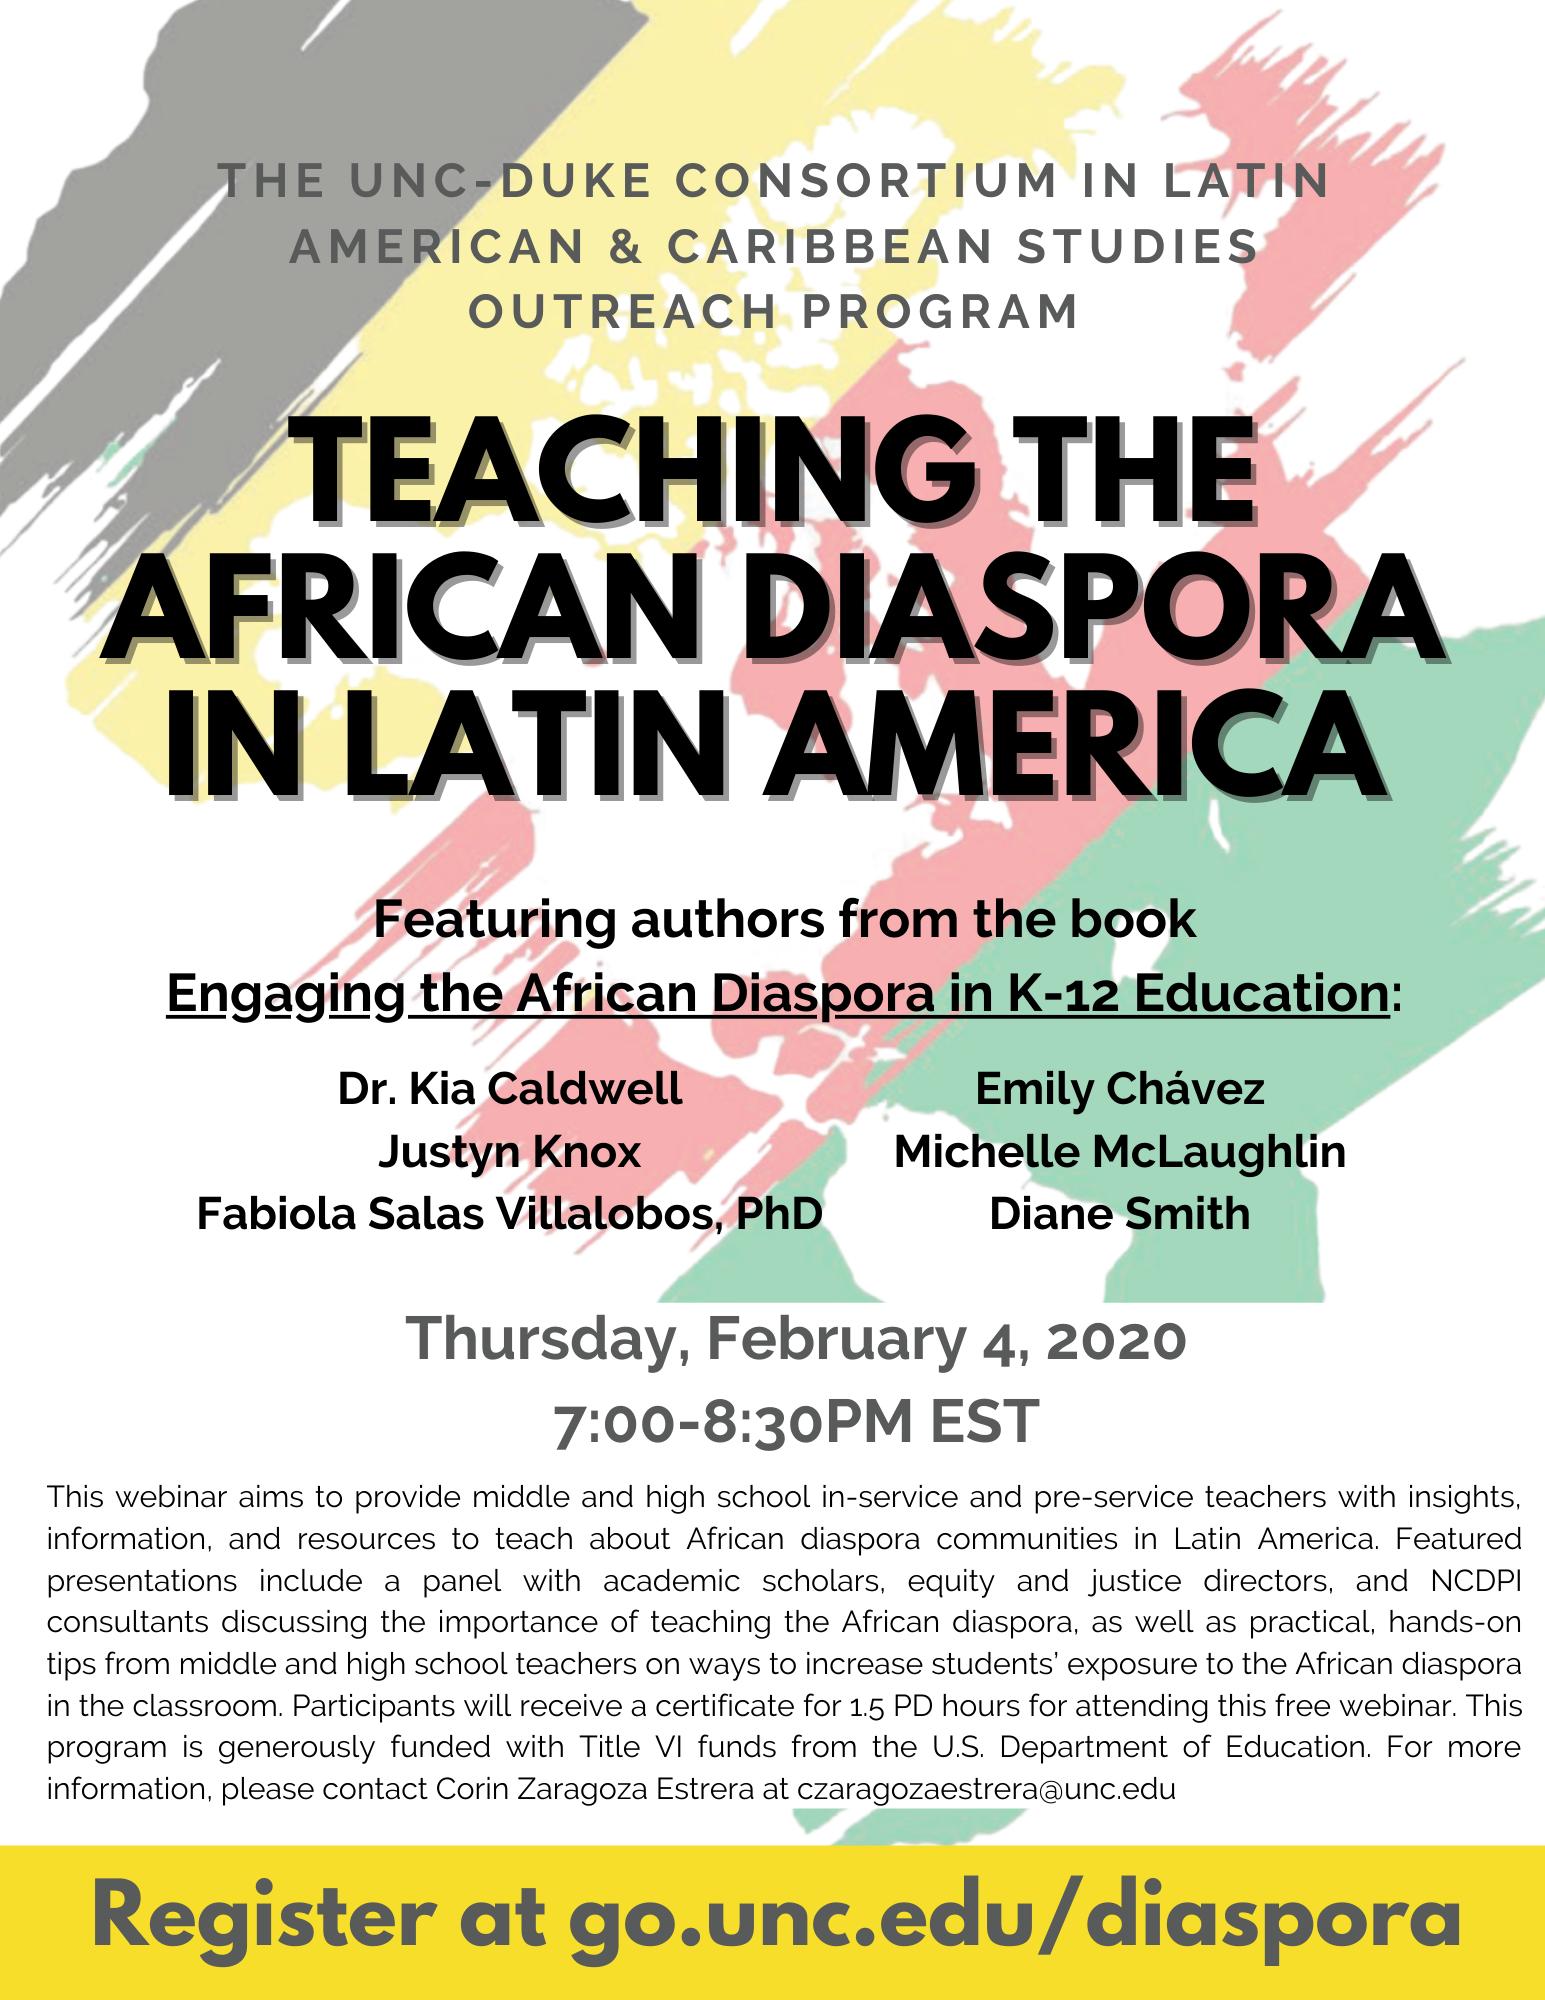 Teaching the African Diaspora in Latin America